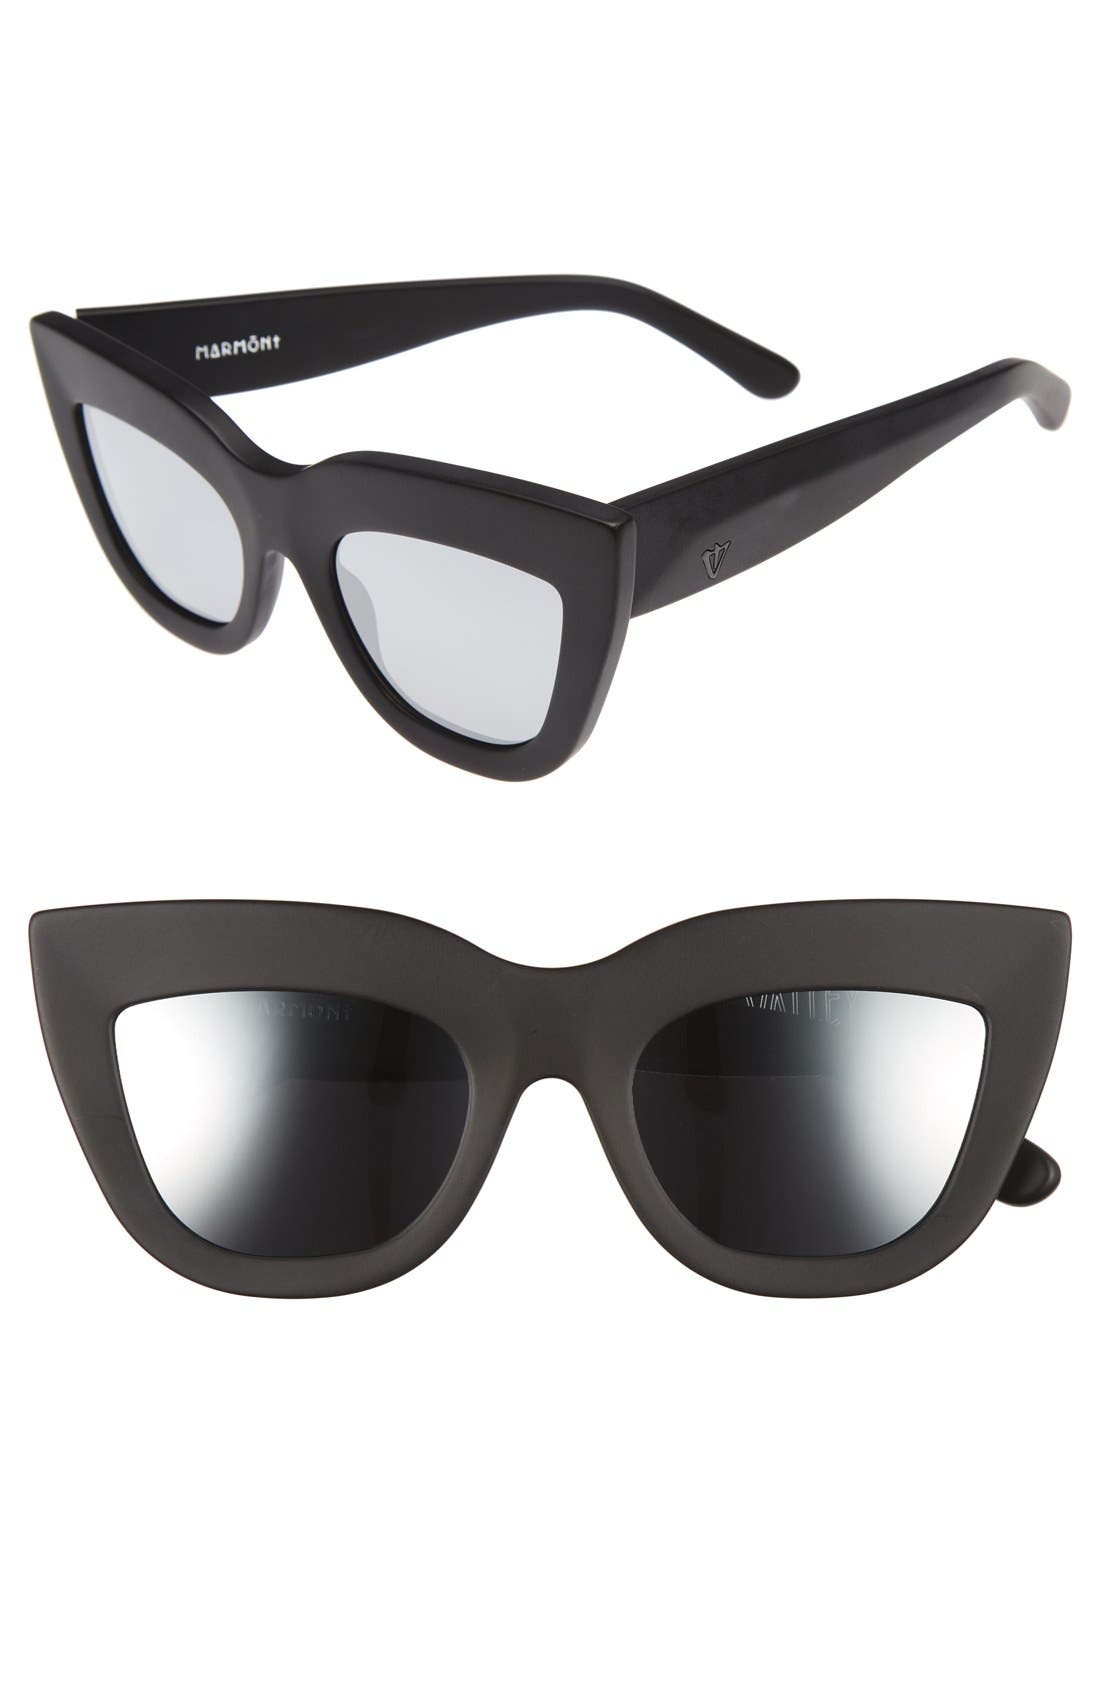 Marmont 52mm Cat Eye Sunglasses,                             Main thumbnail 1, color,                             Matte Black